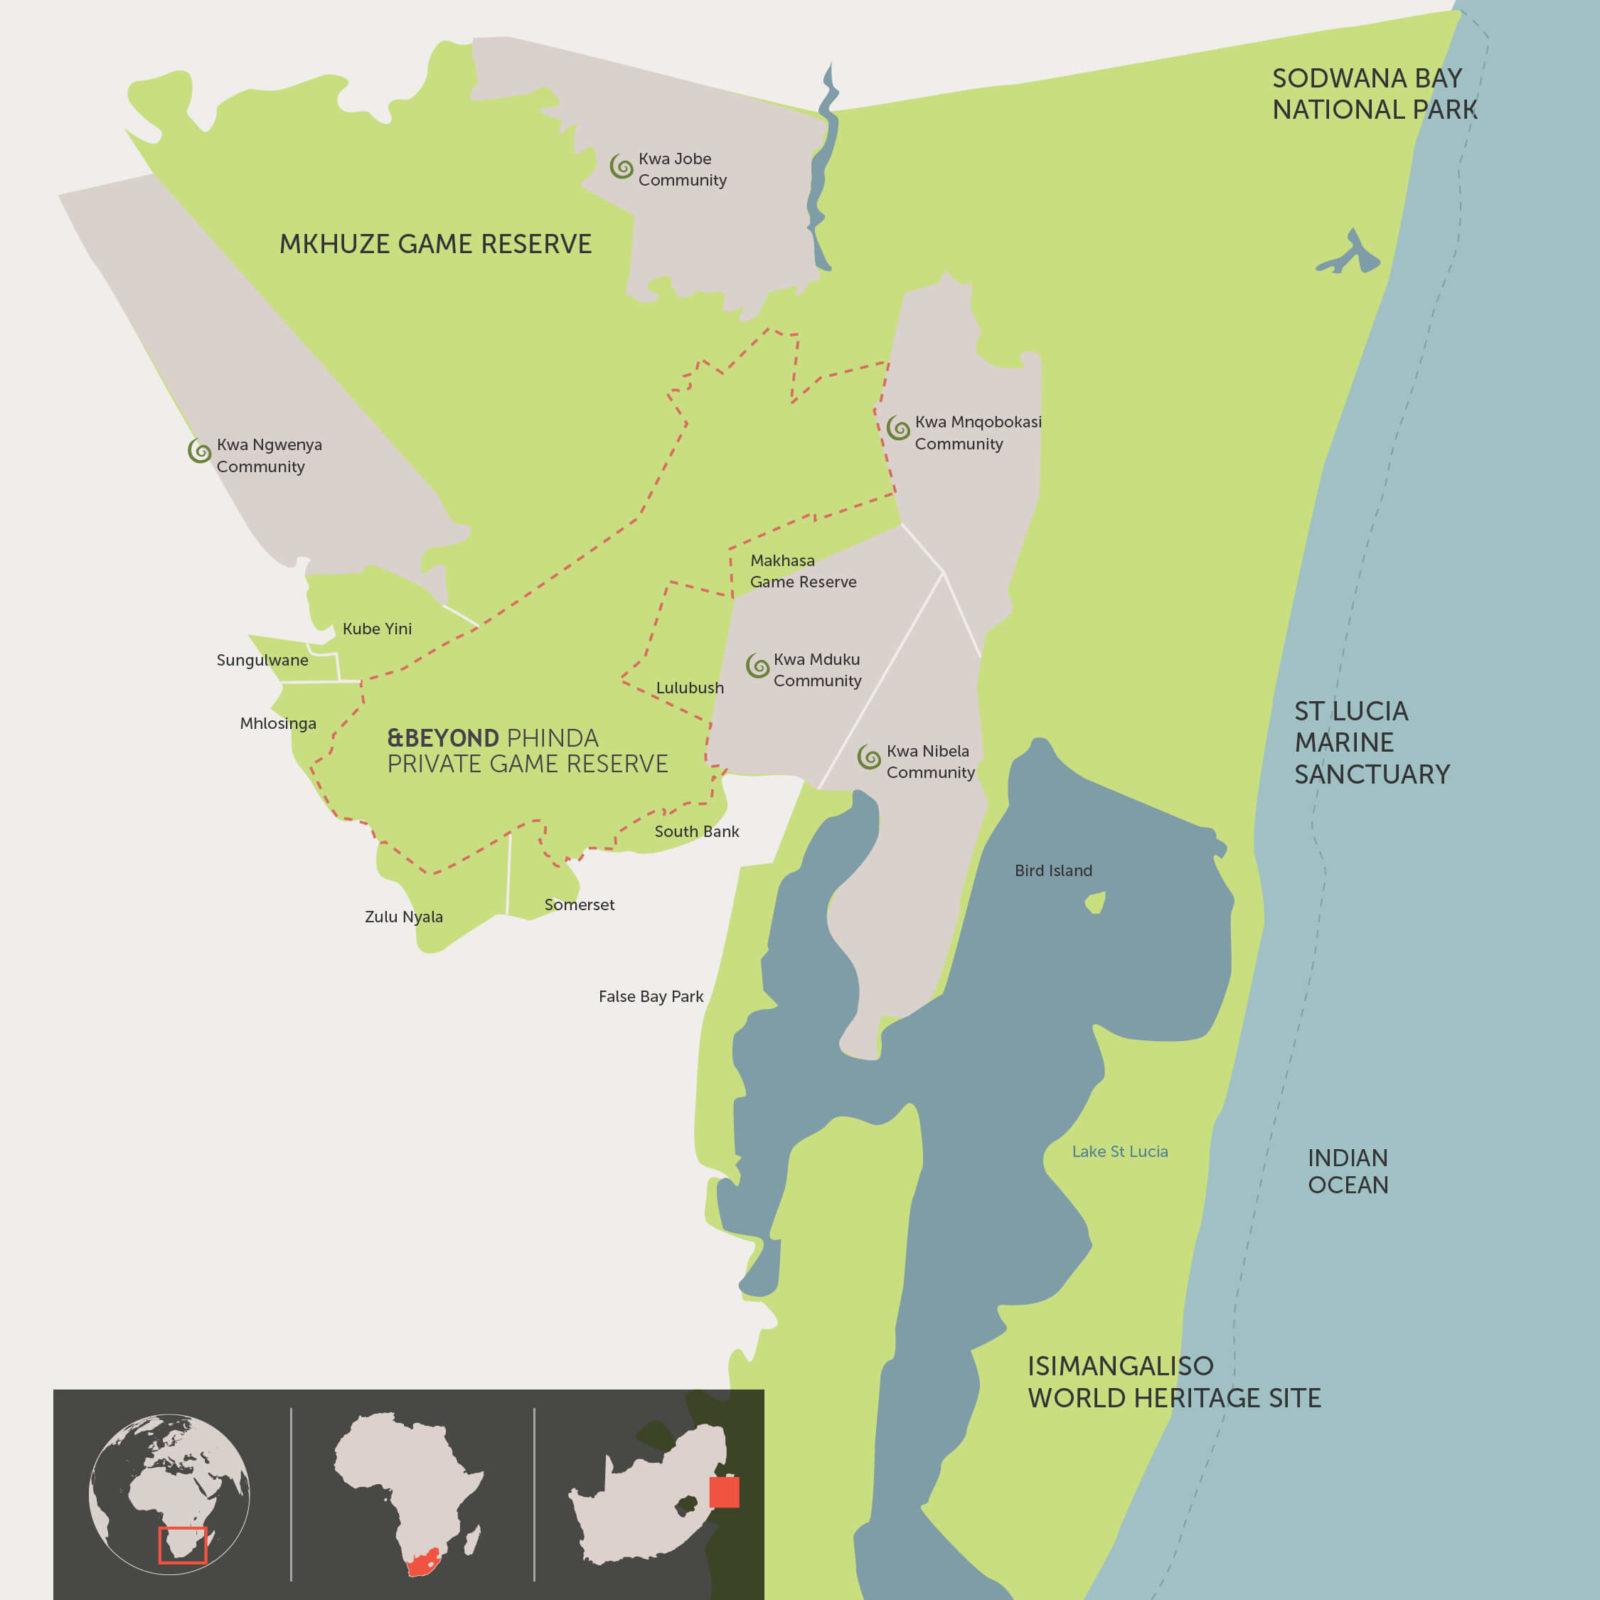 Carte de iSimangaliso Wetland Park